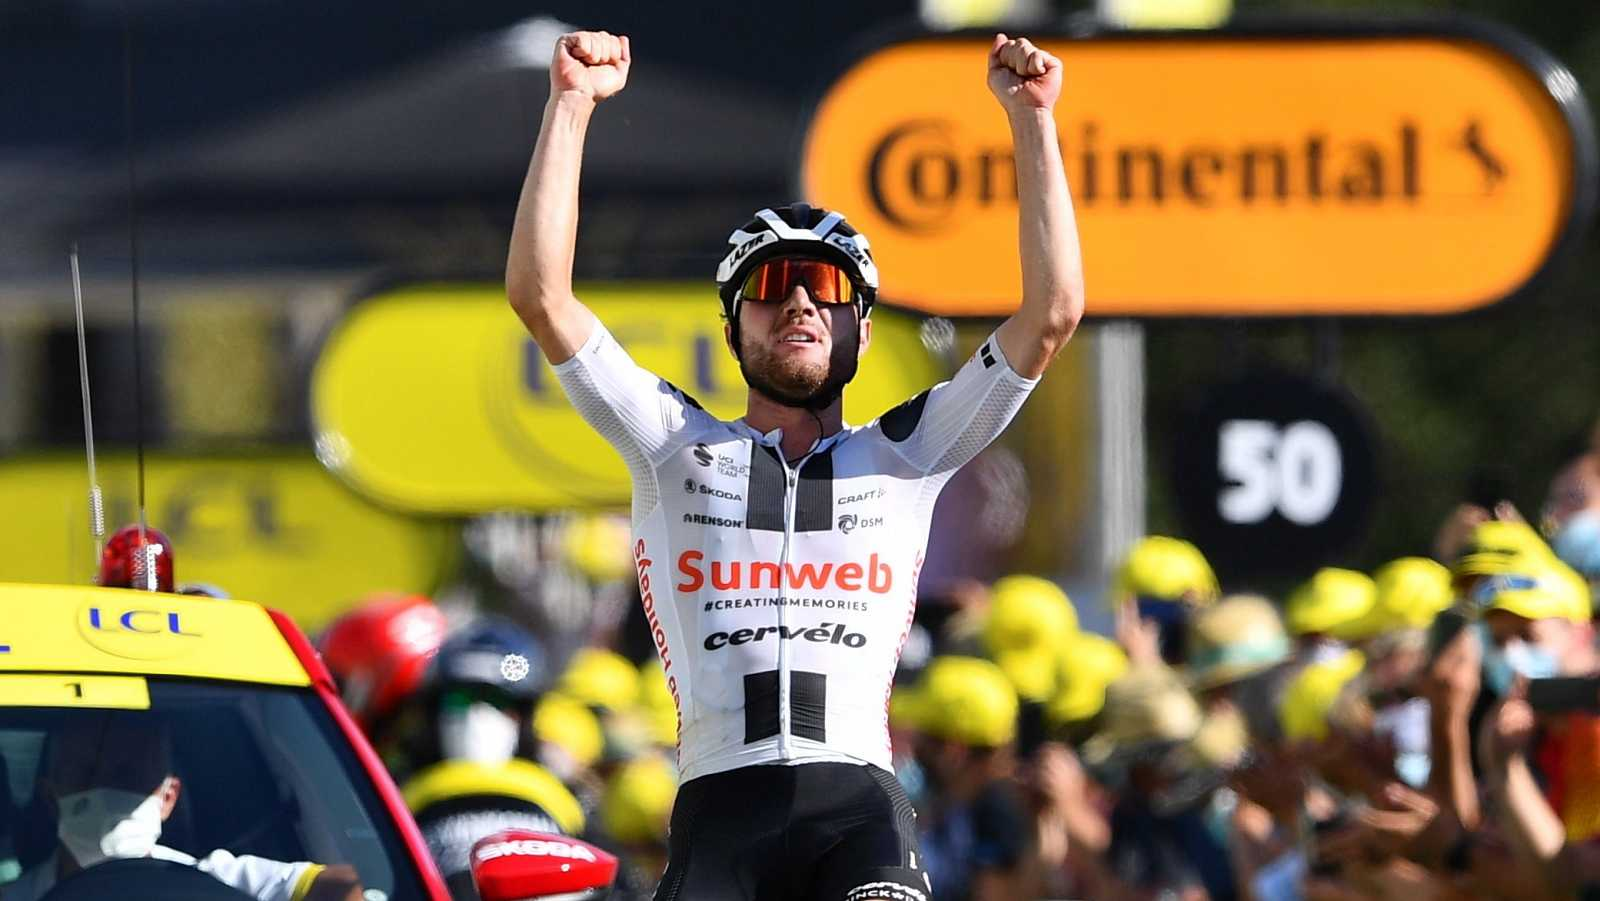 El suizo Hirschi se impone en la duodécima etapa al tercer intento